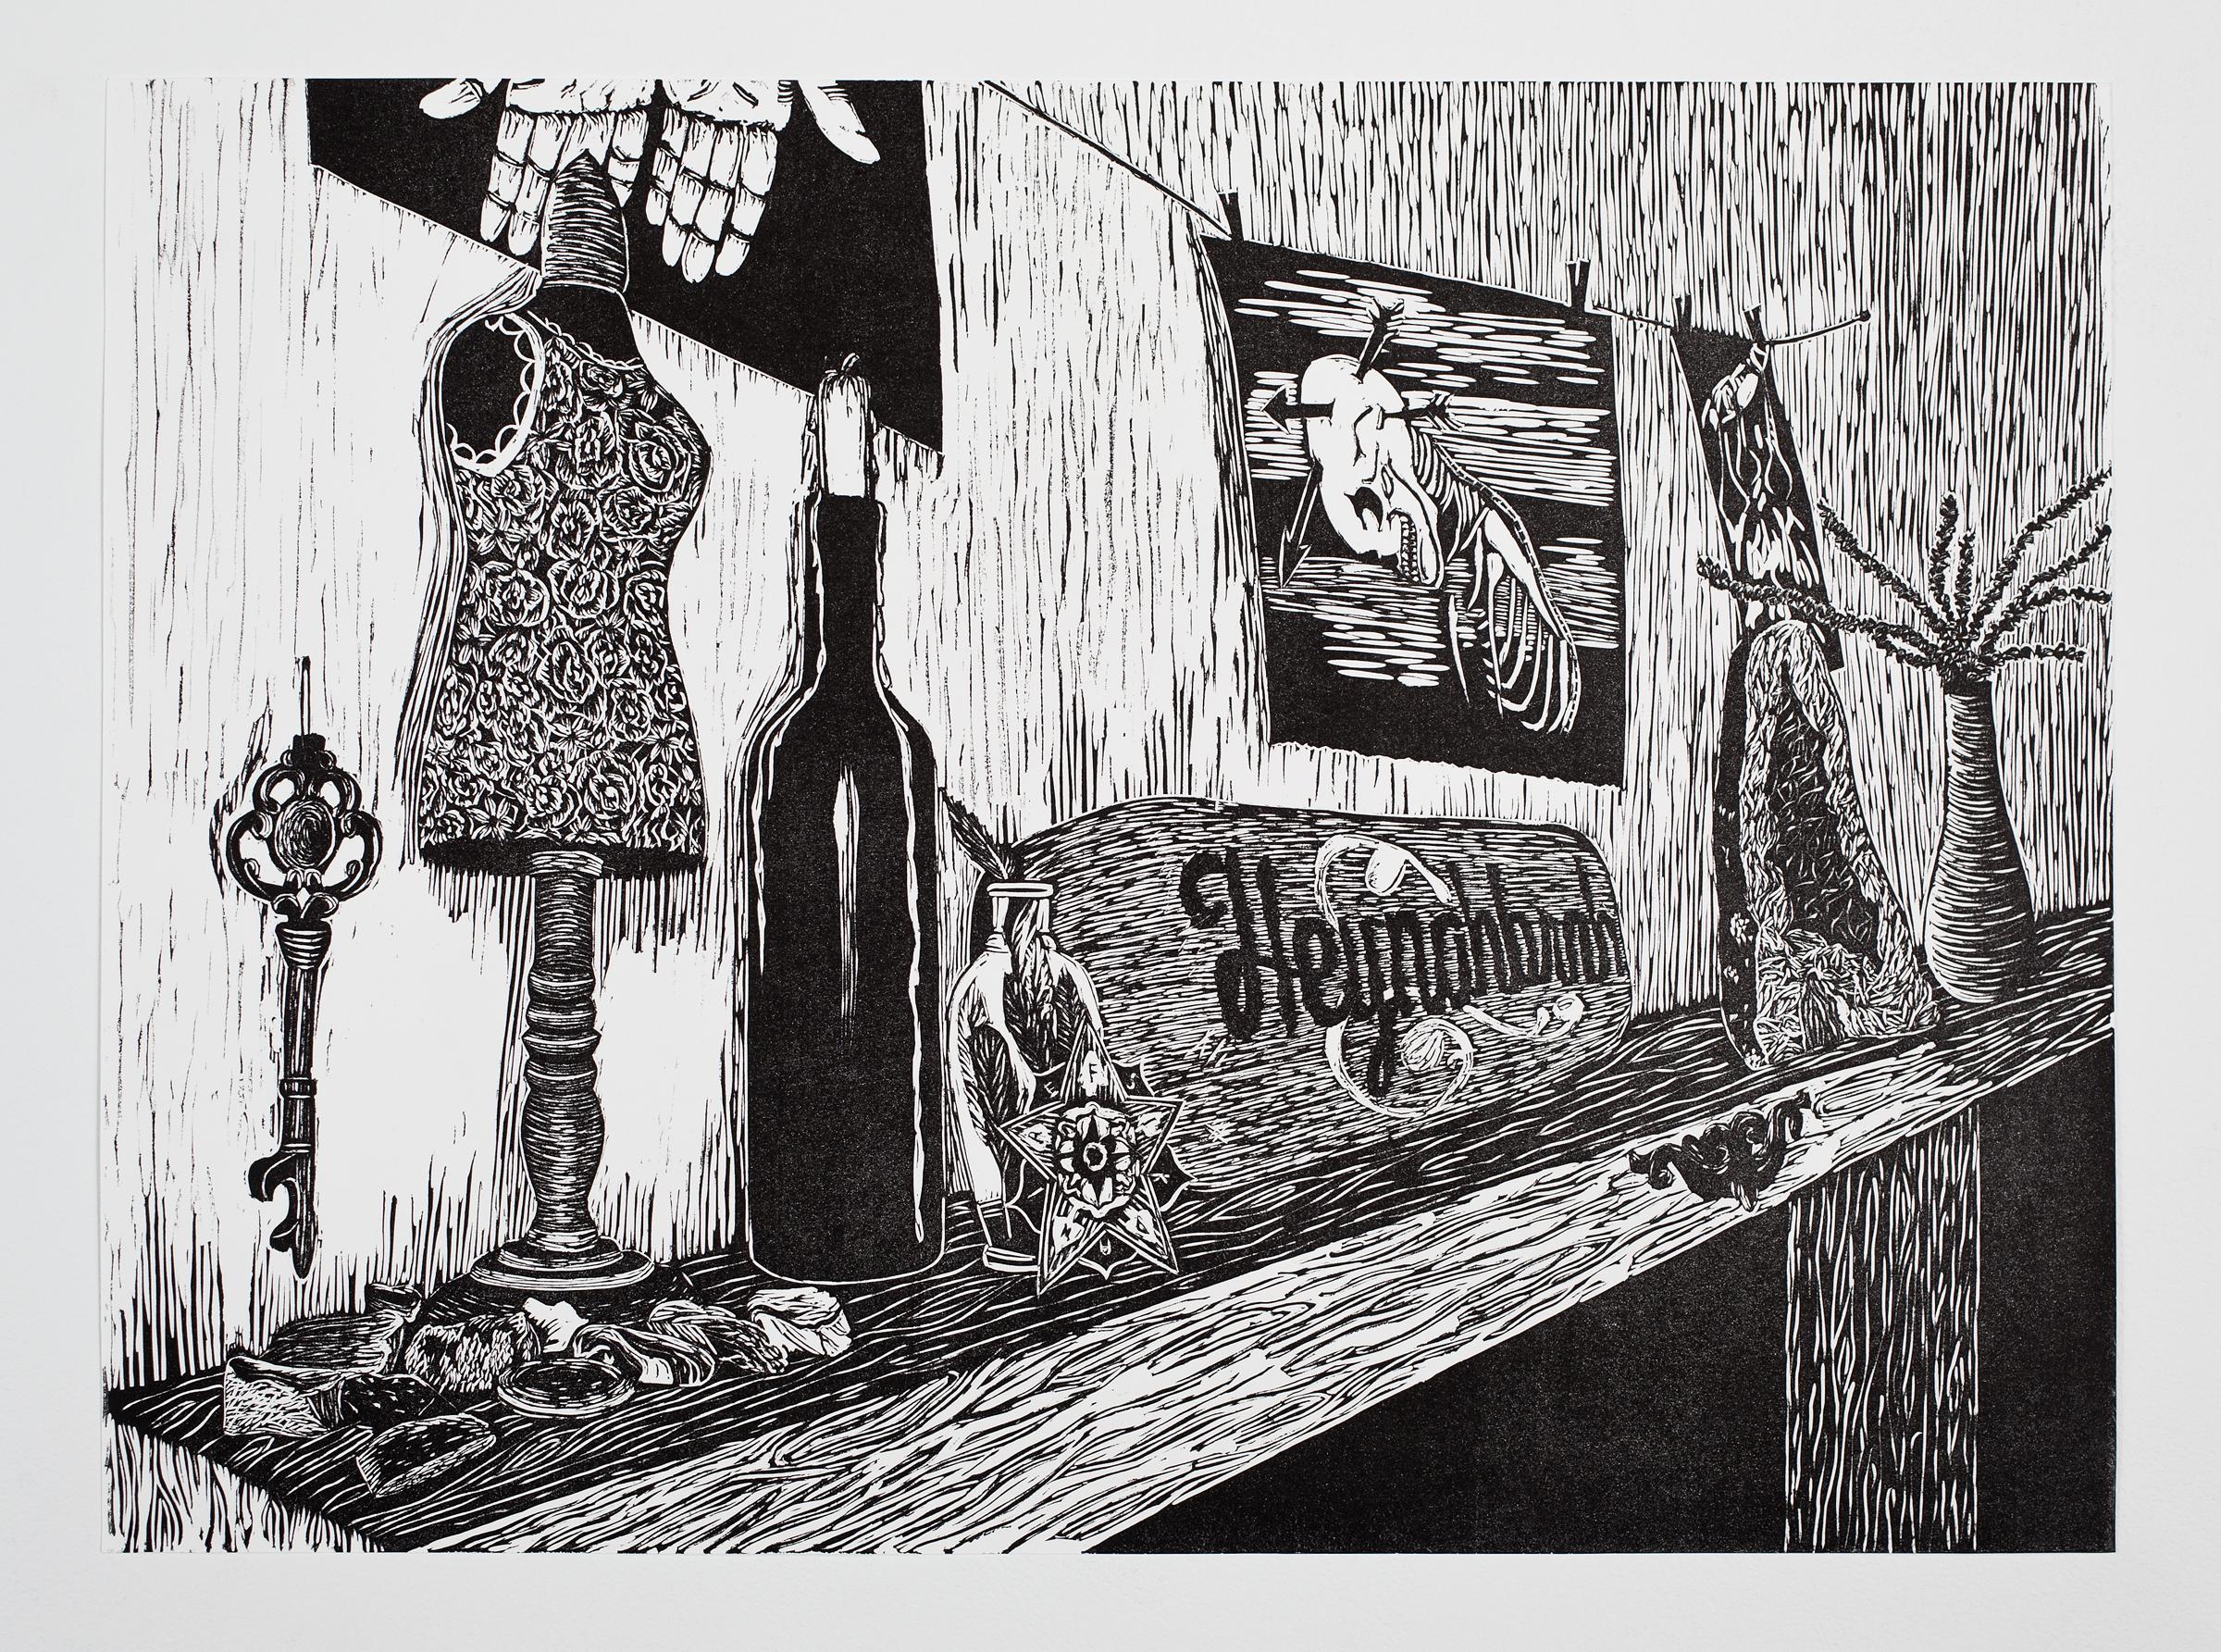 """Mantle"", linoleum relief, 18x24"